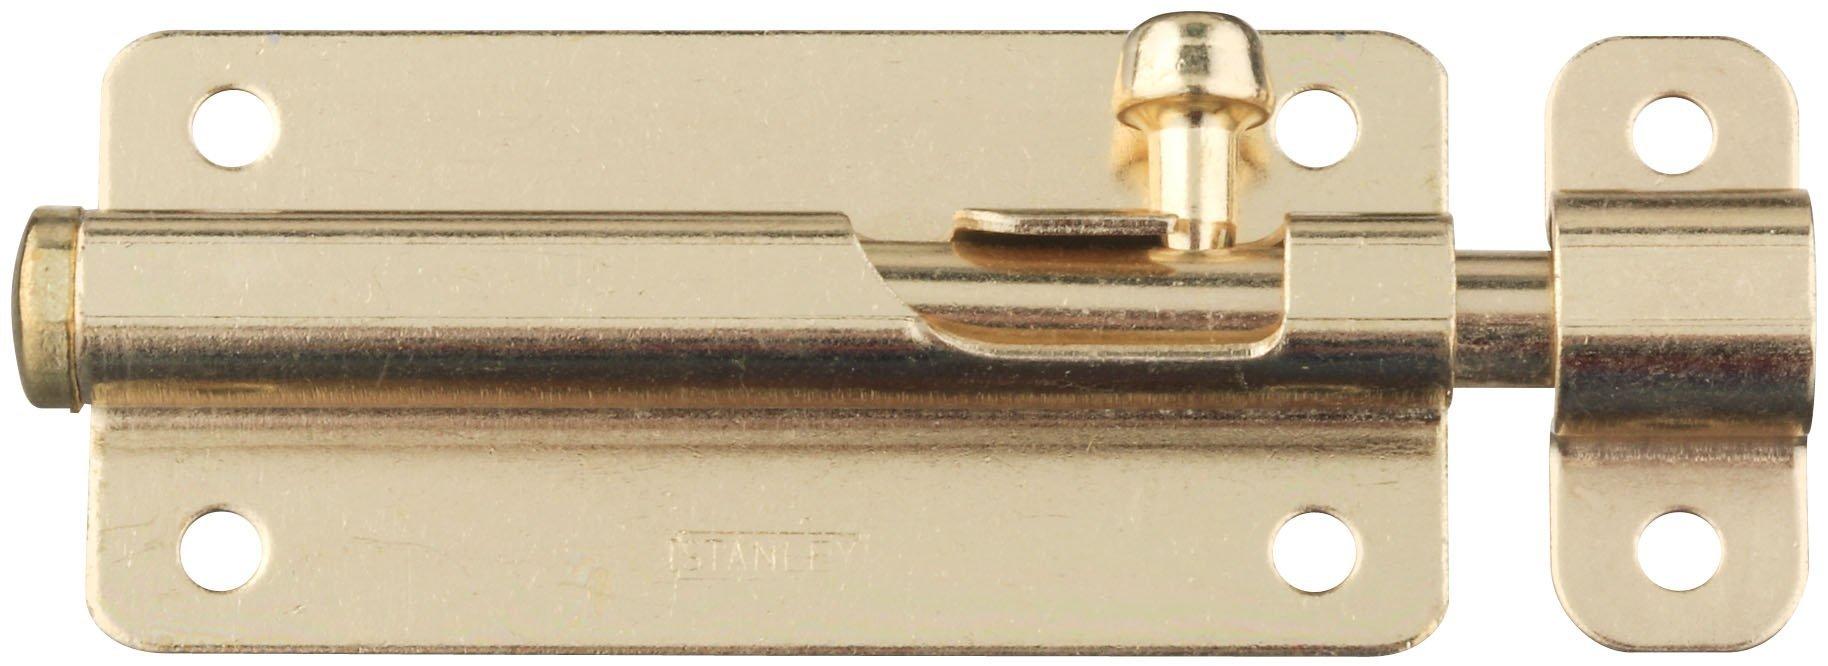 Stanley Hardware S756-400 CD2003 Spring-Lock Barrel Bolt in Bright Brass